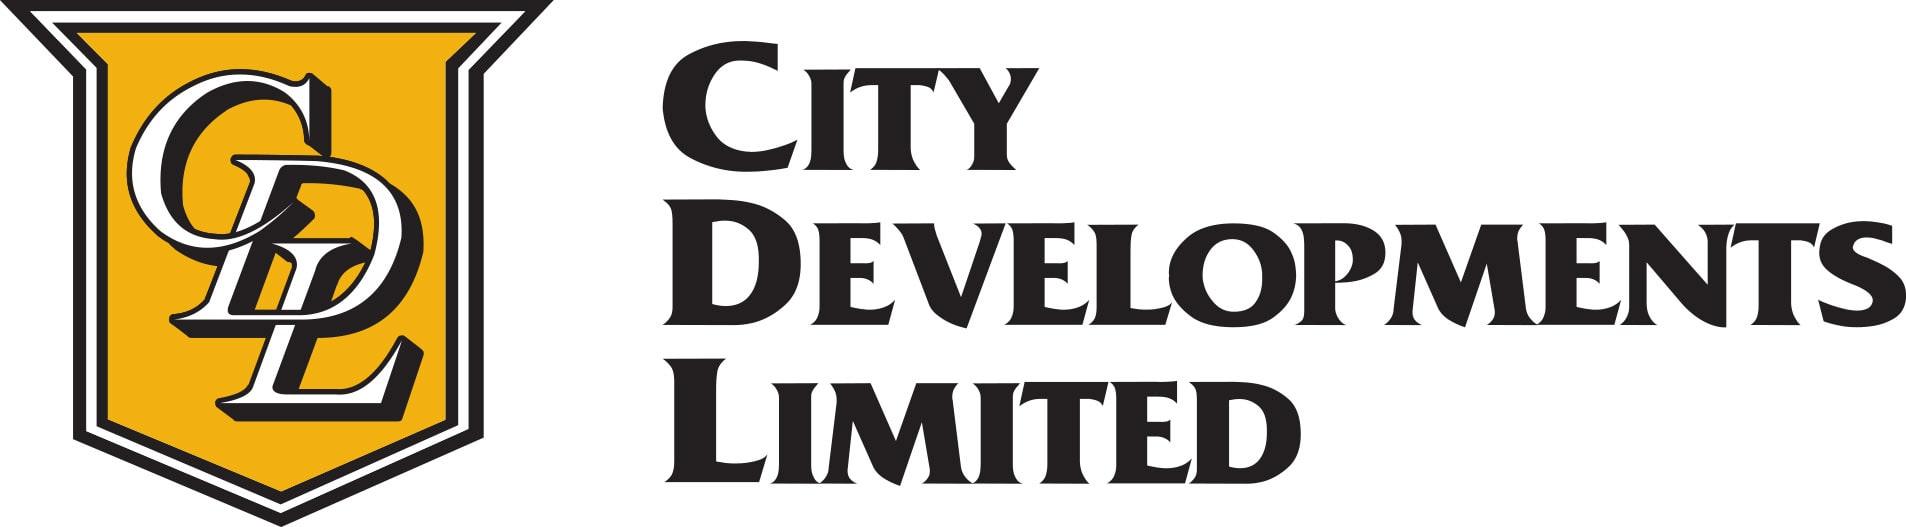 city development limited logo